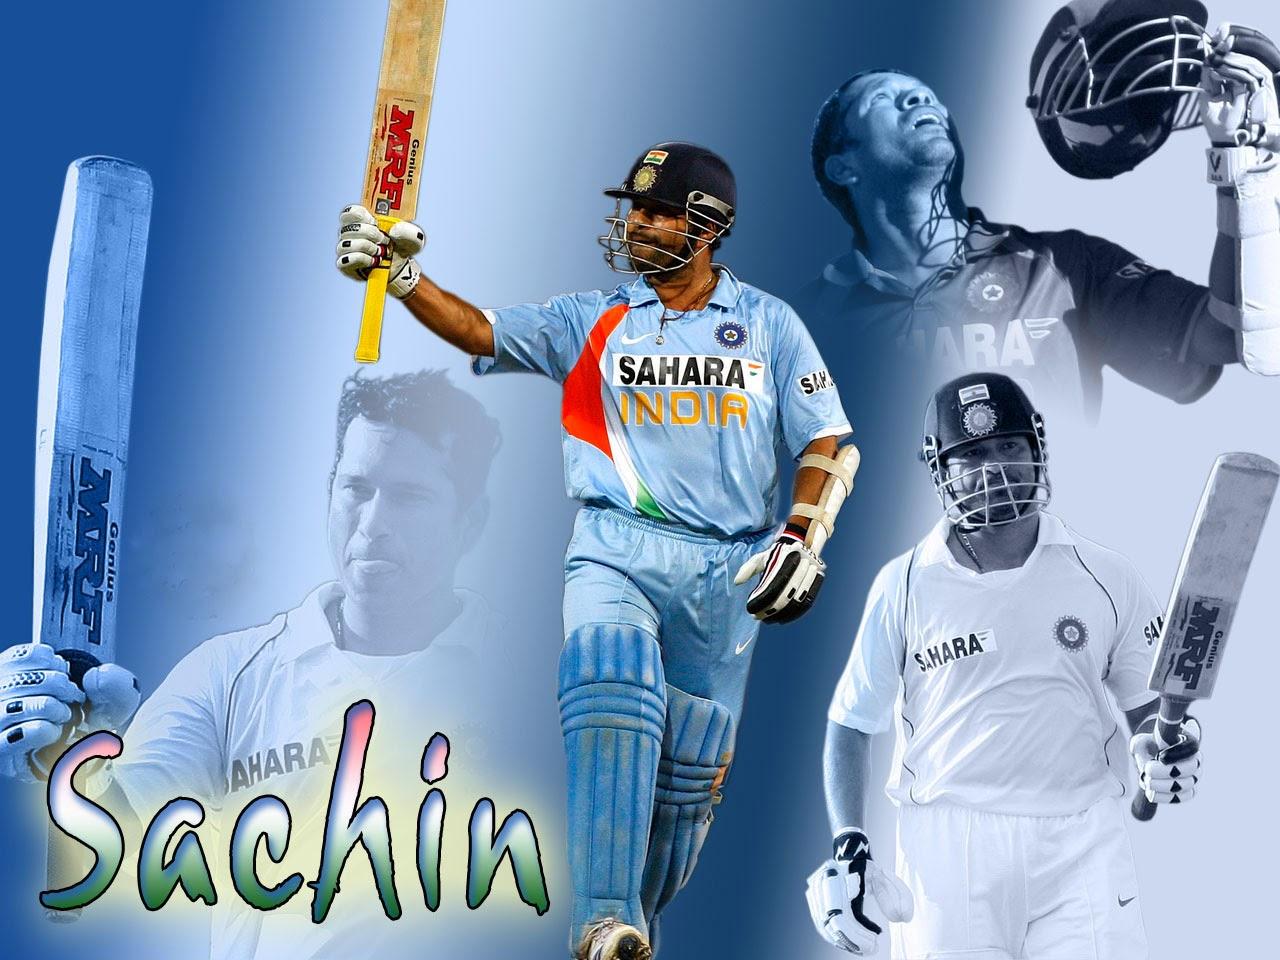 Wallpapers Of Sachin Tendulkar Free Download ~ Unique ... Sachin Tendulkar Wallpapers Hd